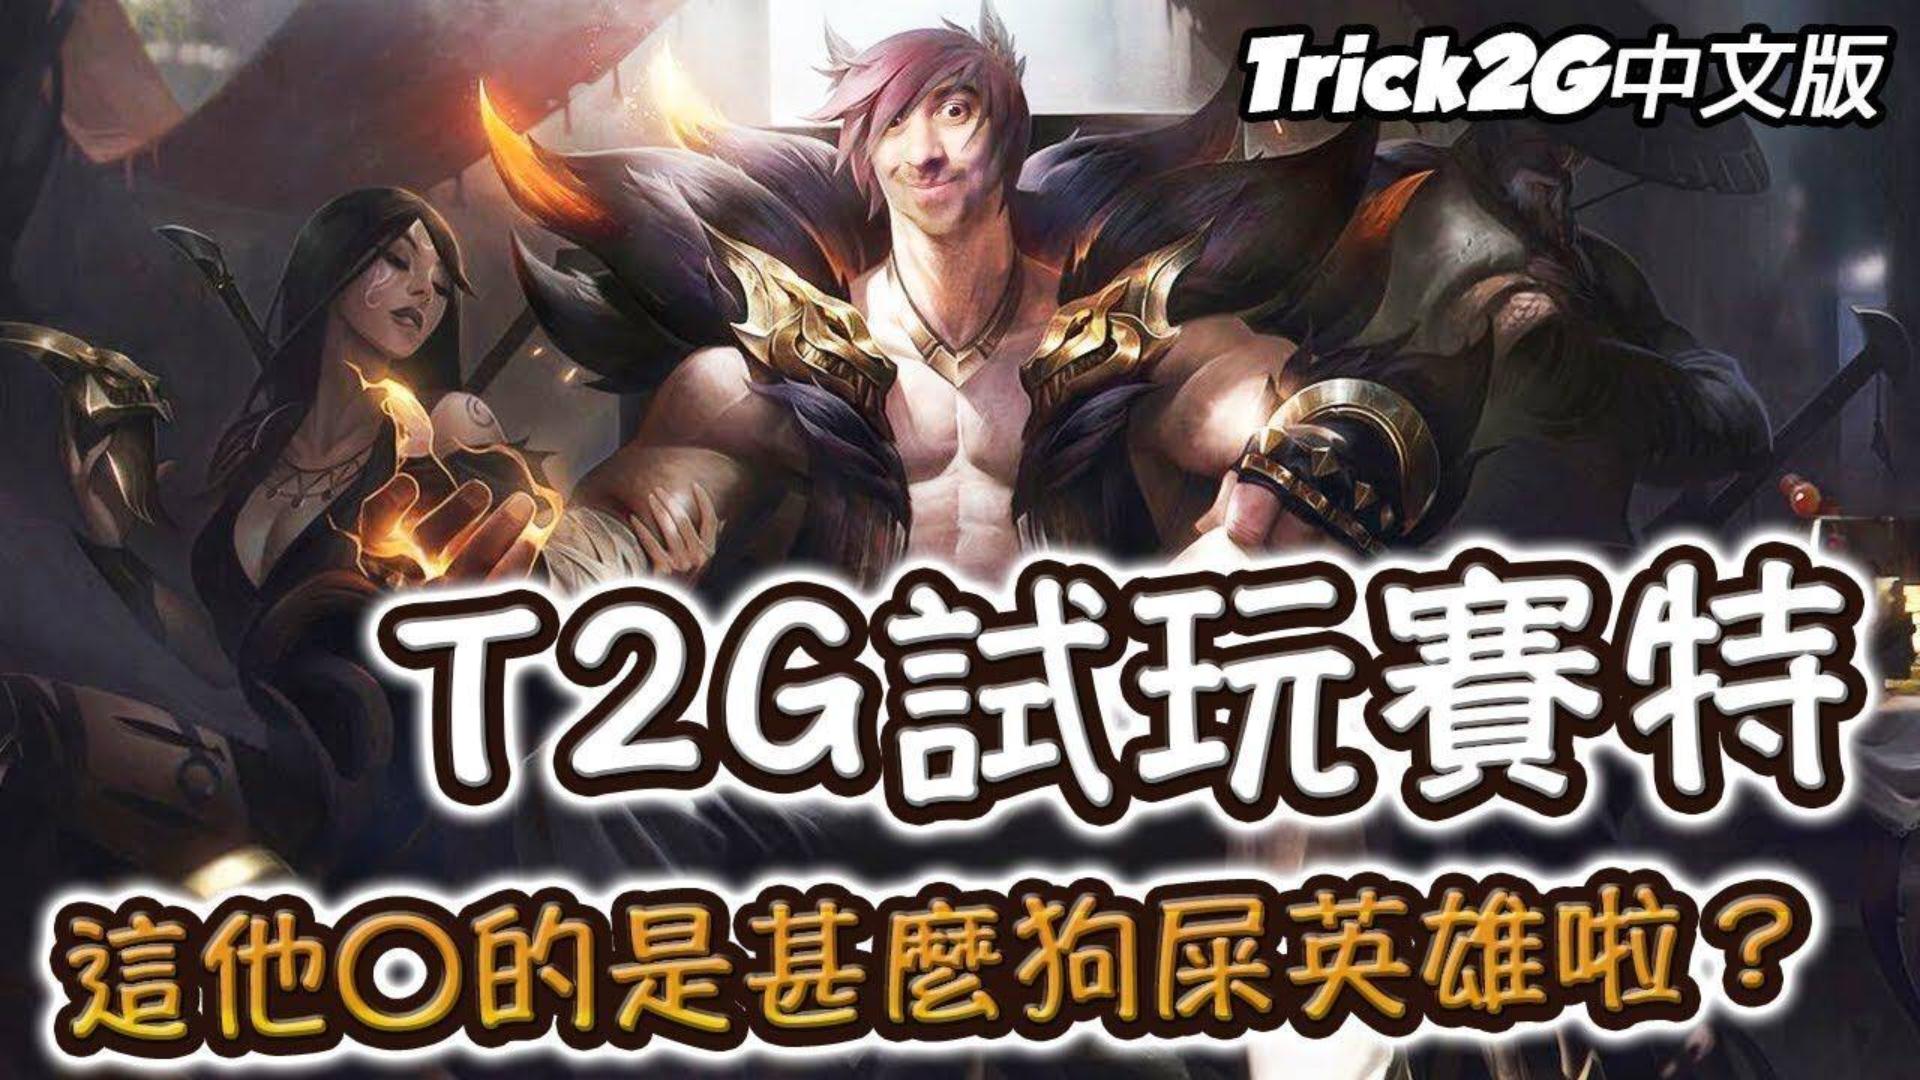 Trick2G-  賽特試玩  到底是誰說這英雄OP啦?(中文字幕) -LoL英雄聯盟